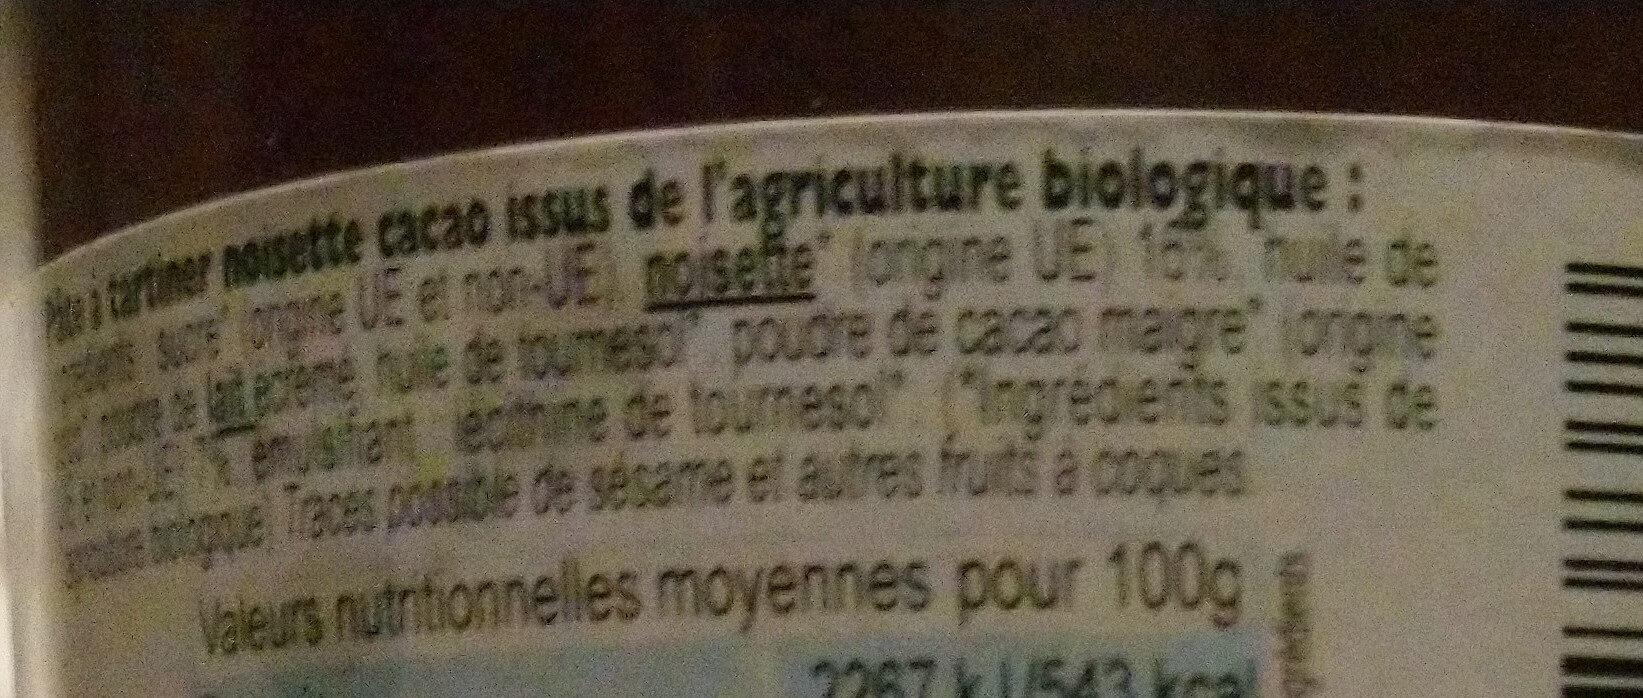 Pâte à tartiner bio - Ingrédients - en